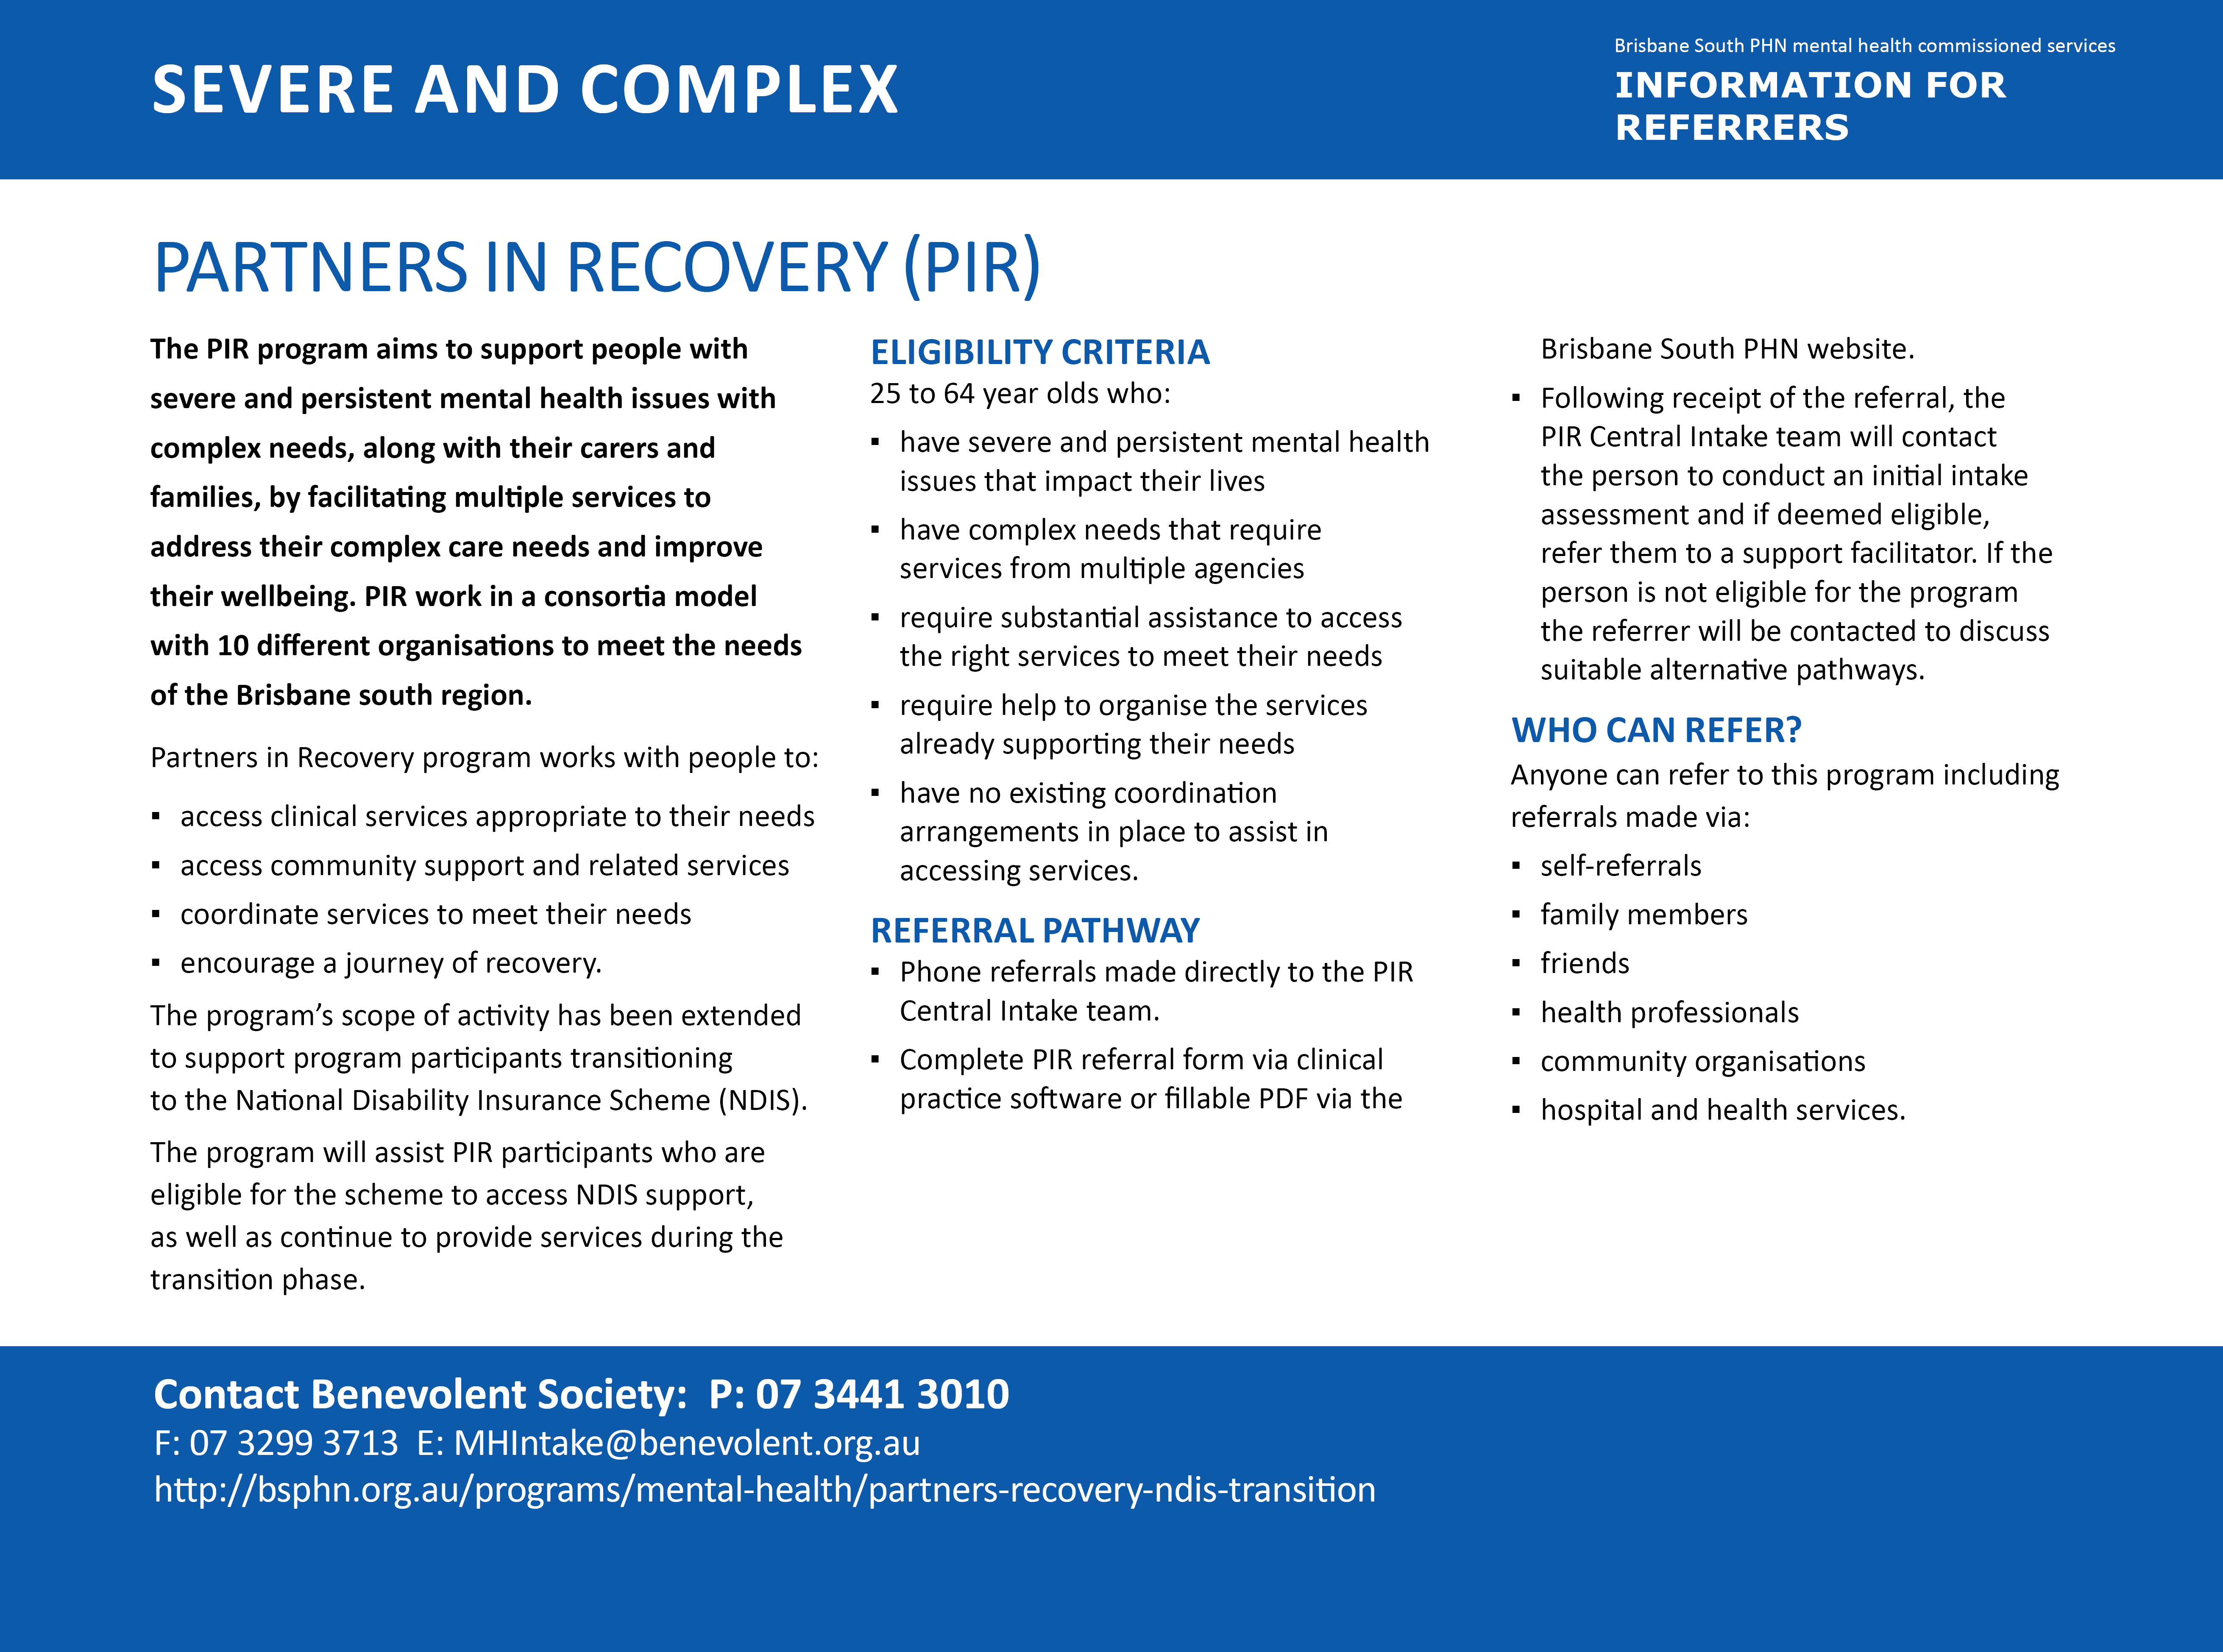 Partners in Recovery (PIR) program